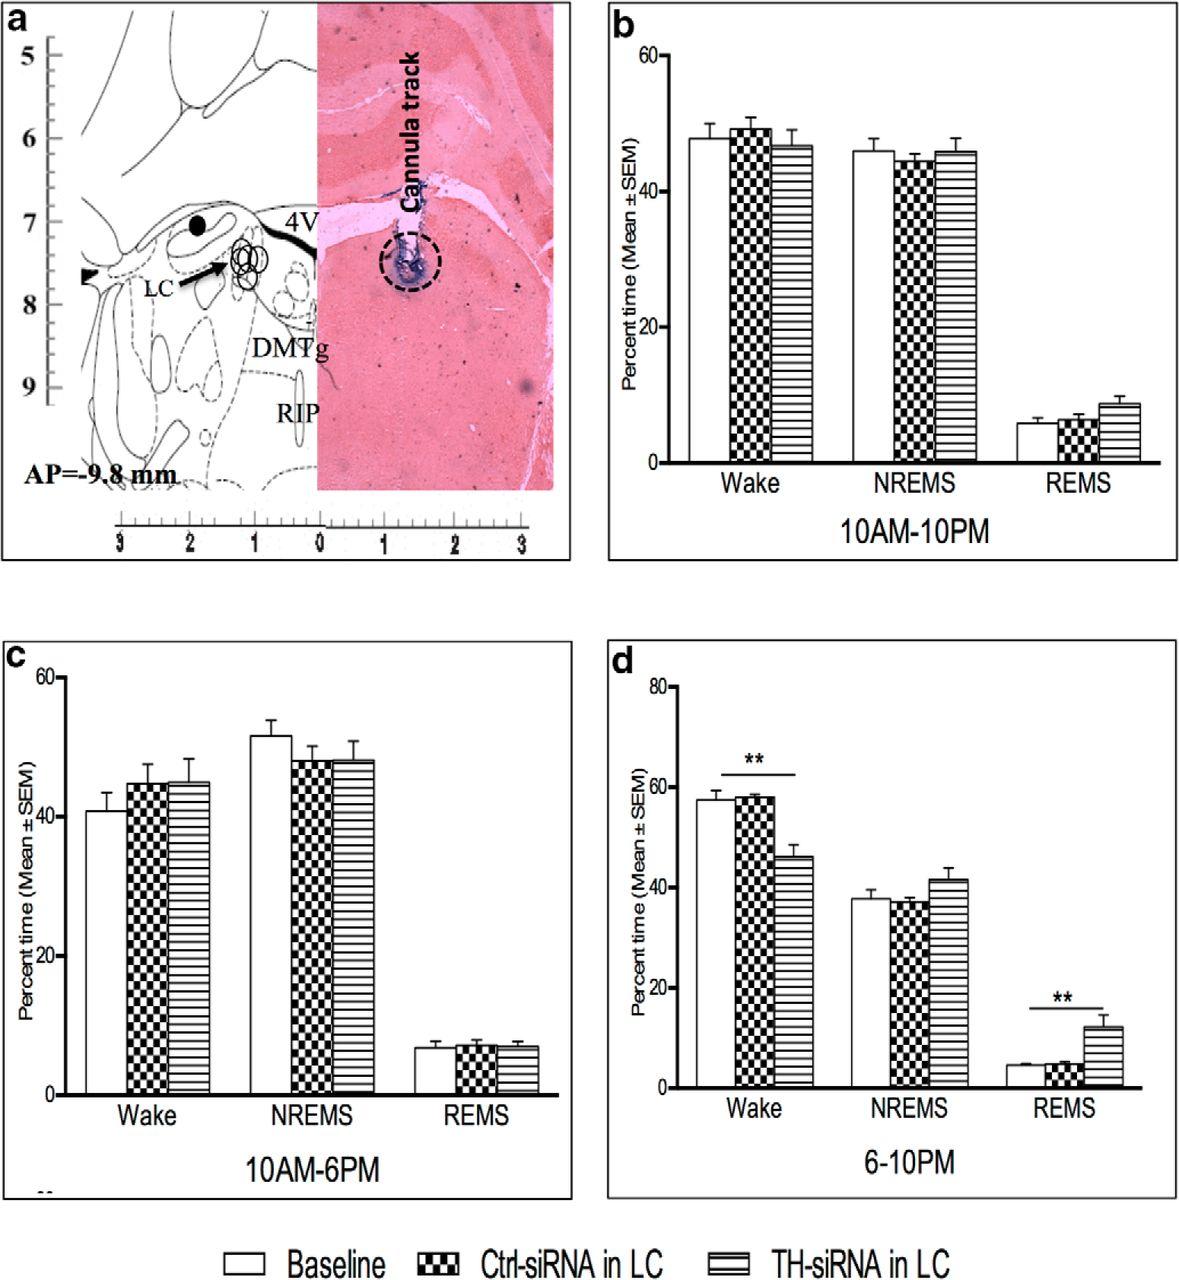 Noradrenaline From Locus Coeruleus Neurons Acts On Pedunculo Pontine Atlas Turn Out Wiring Diagram Download Figure